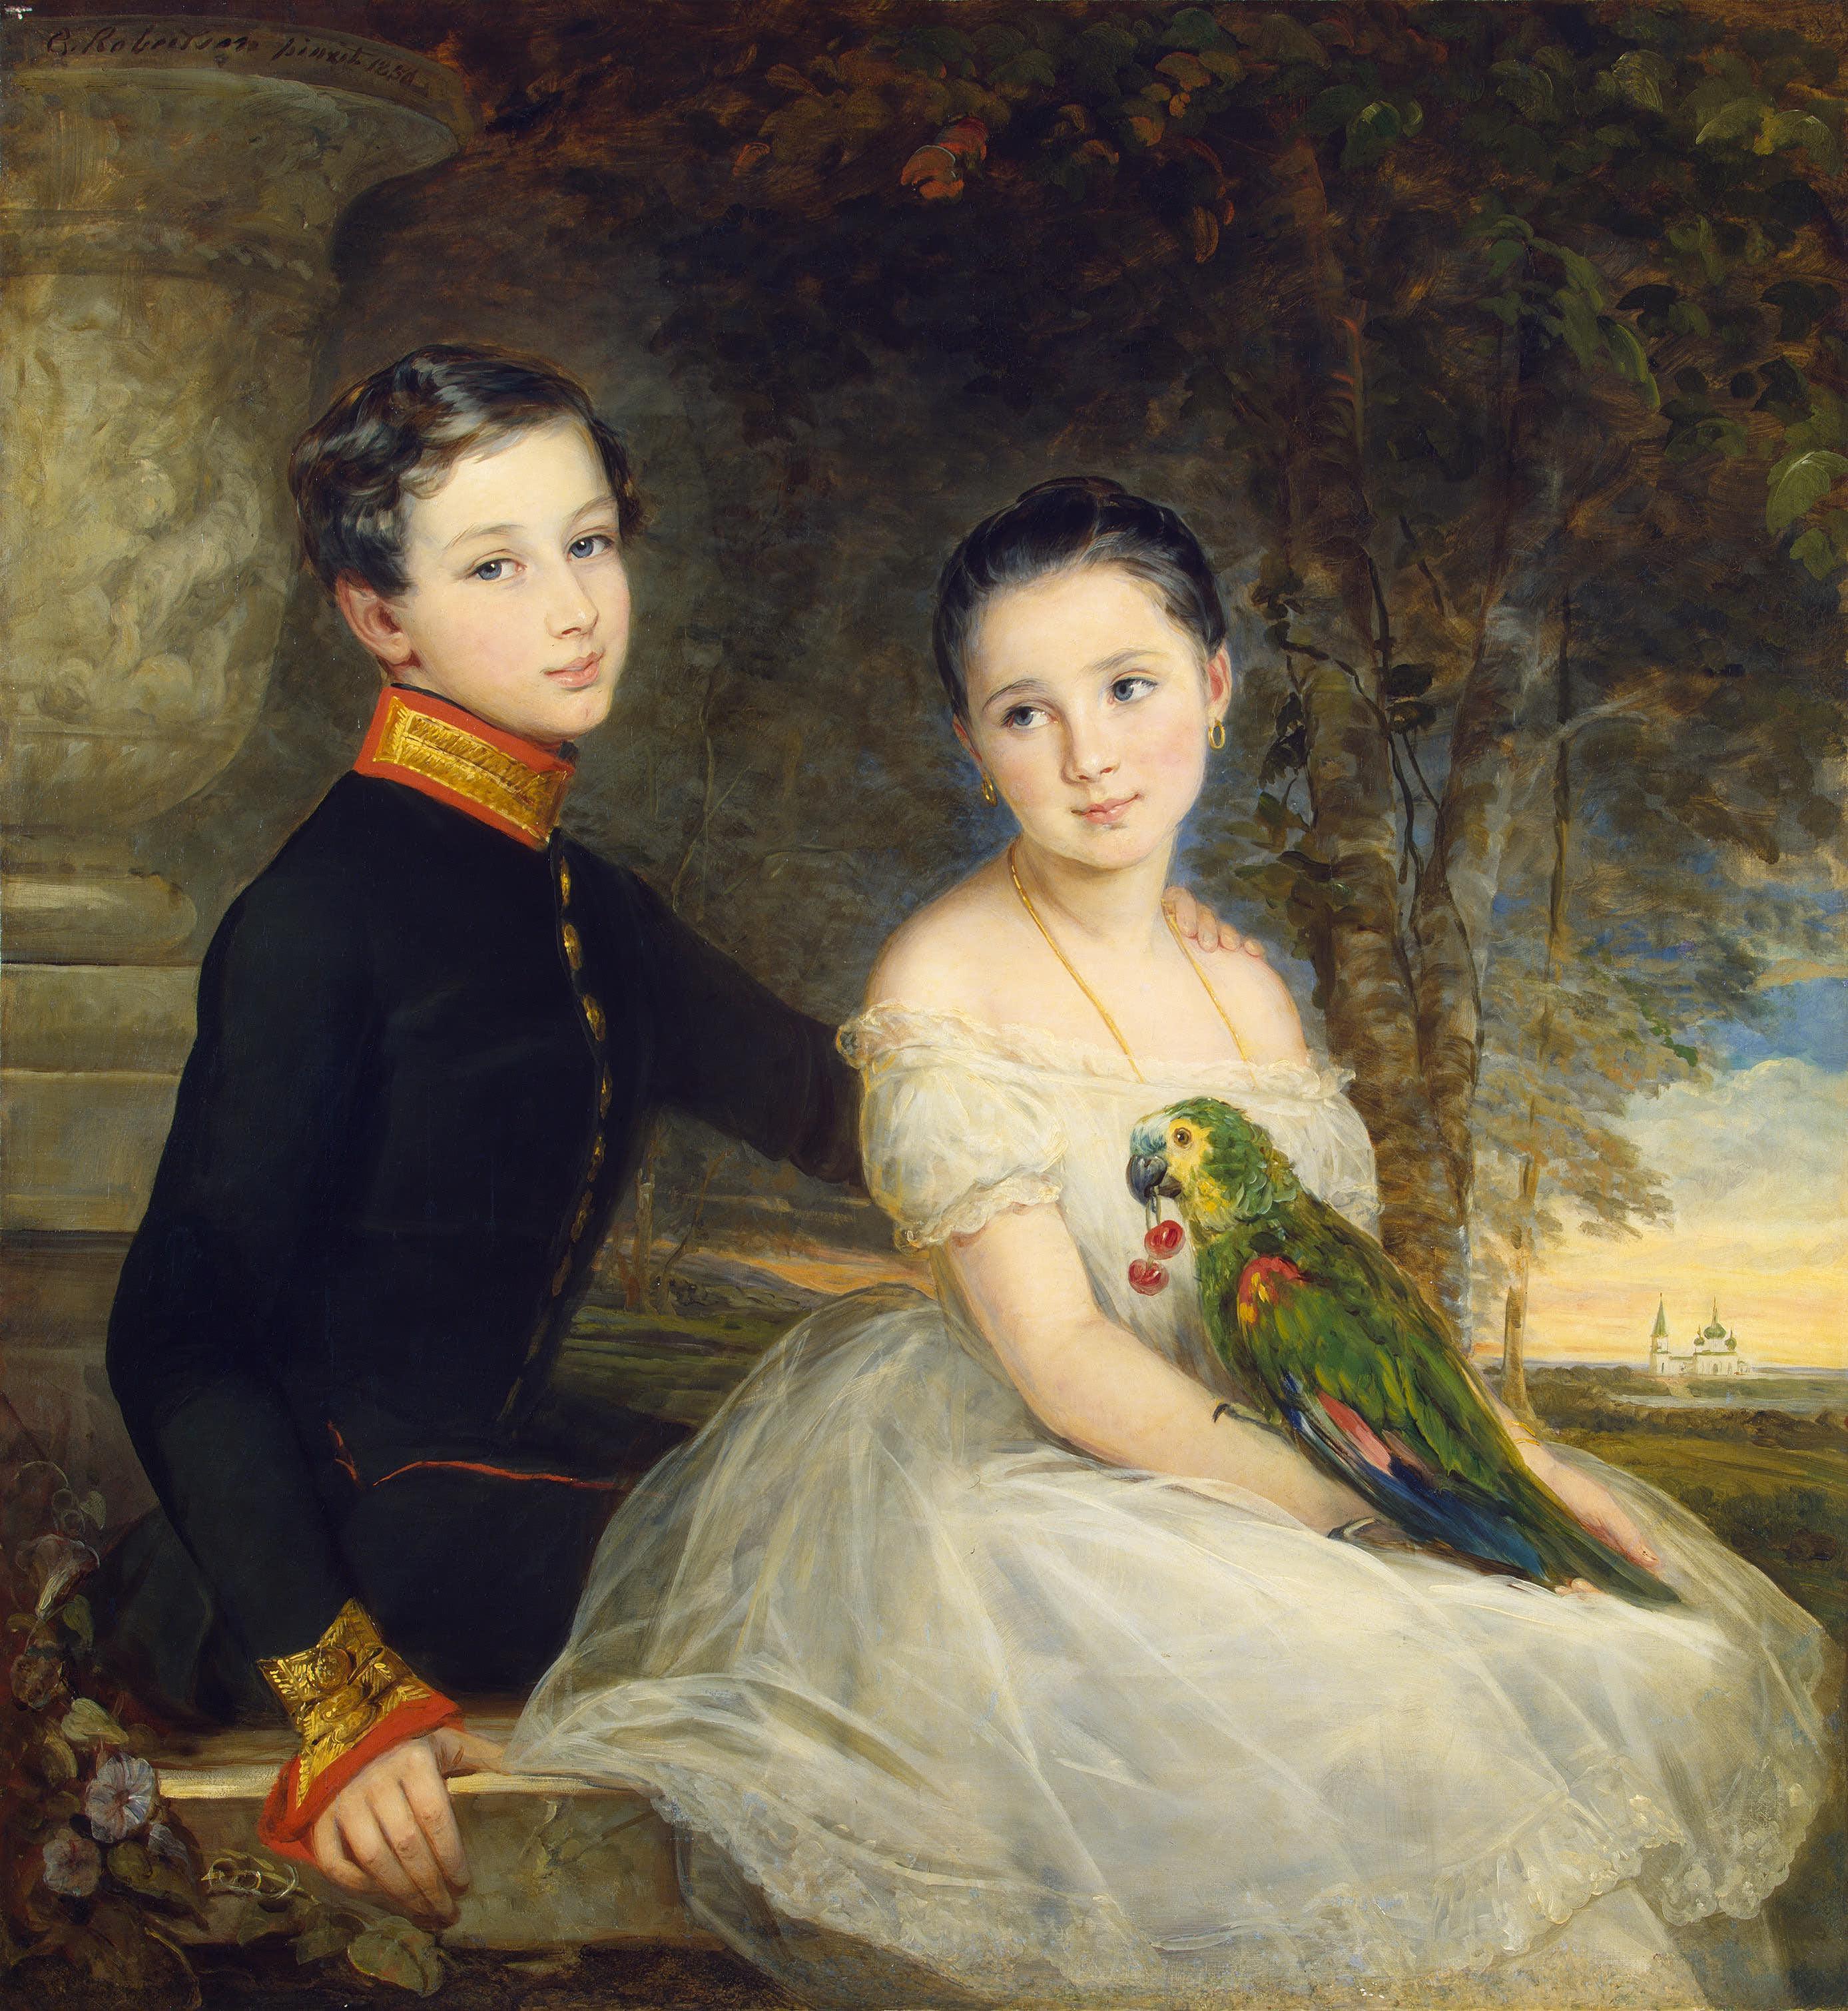 Pet Parrot Depicted Century Art